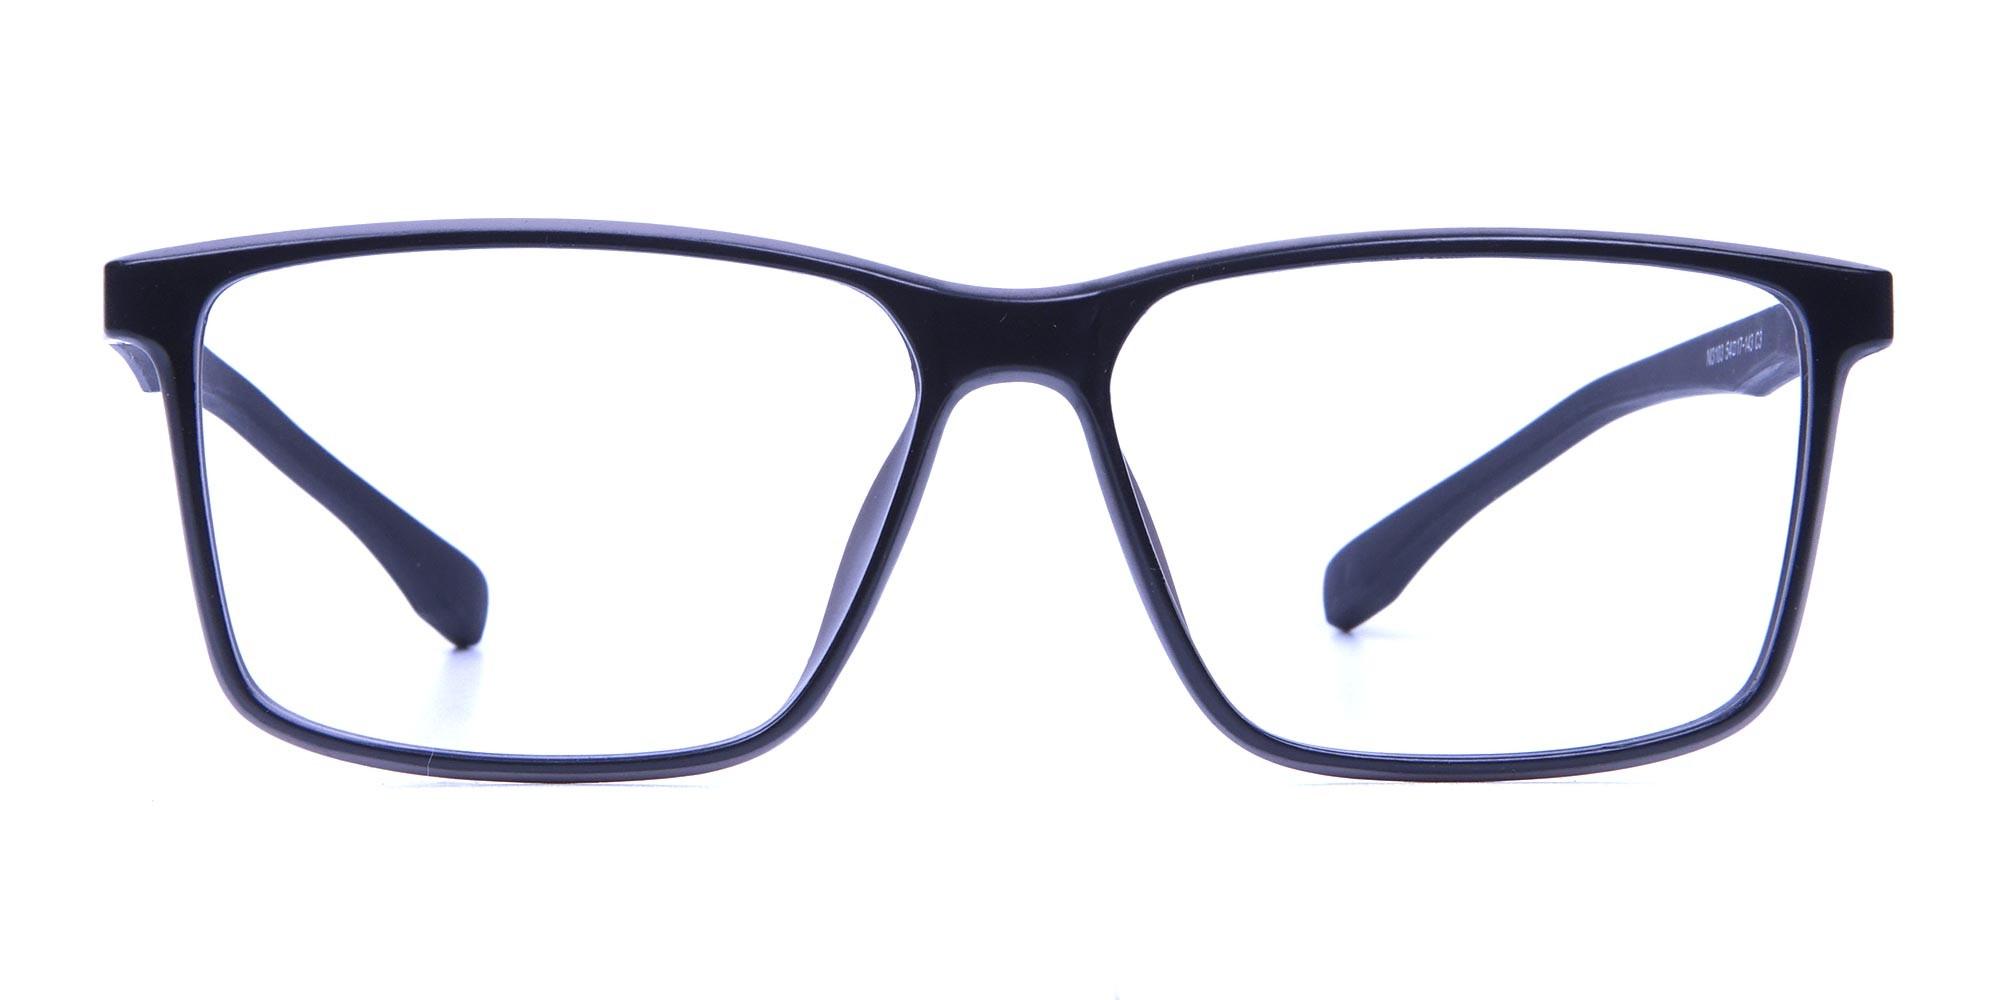 Black & Grey Glasses